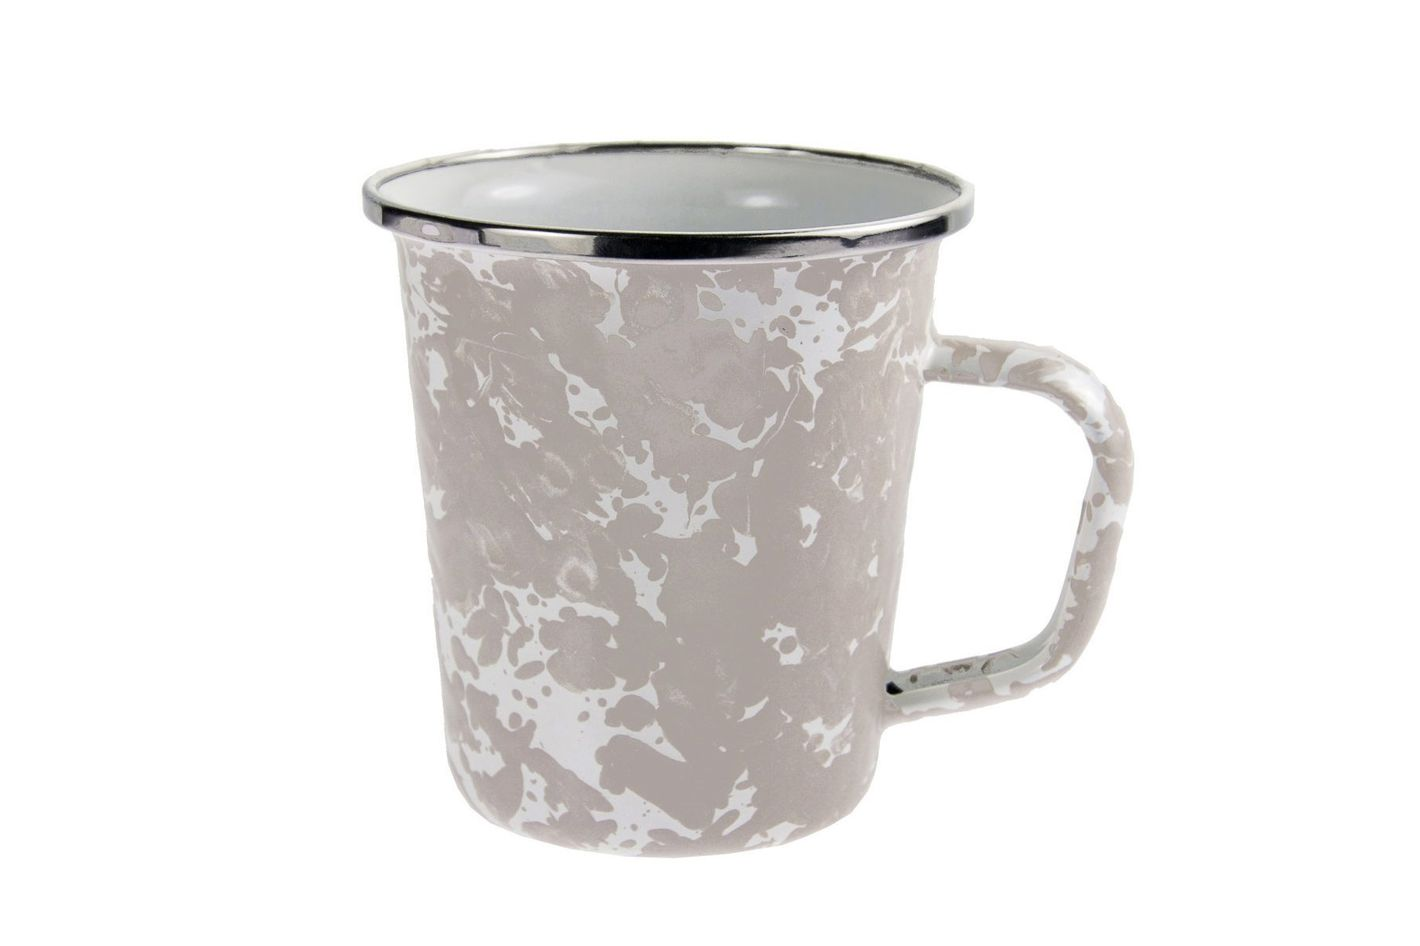 Enamelware — Taupe Swirl Pattern, 16-Ounce Latte Mug